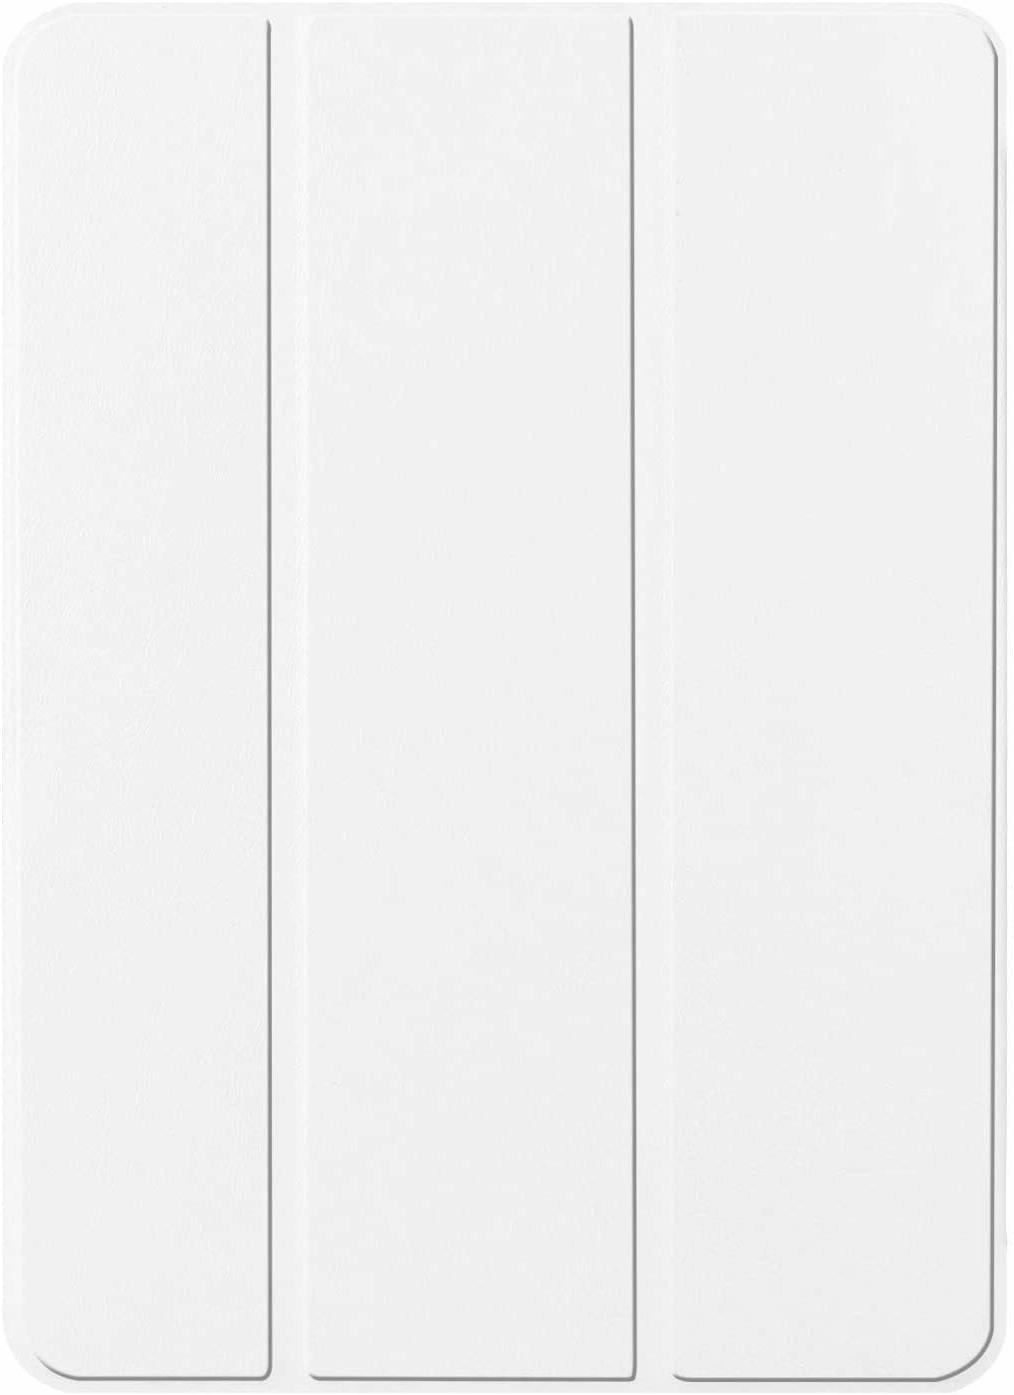 iPad Case Gen Magnetic Cover Apple 2020